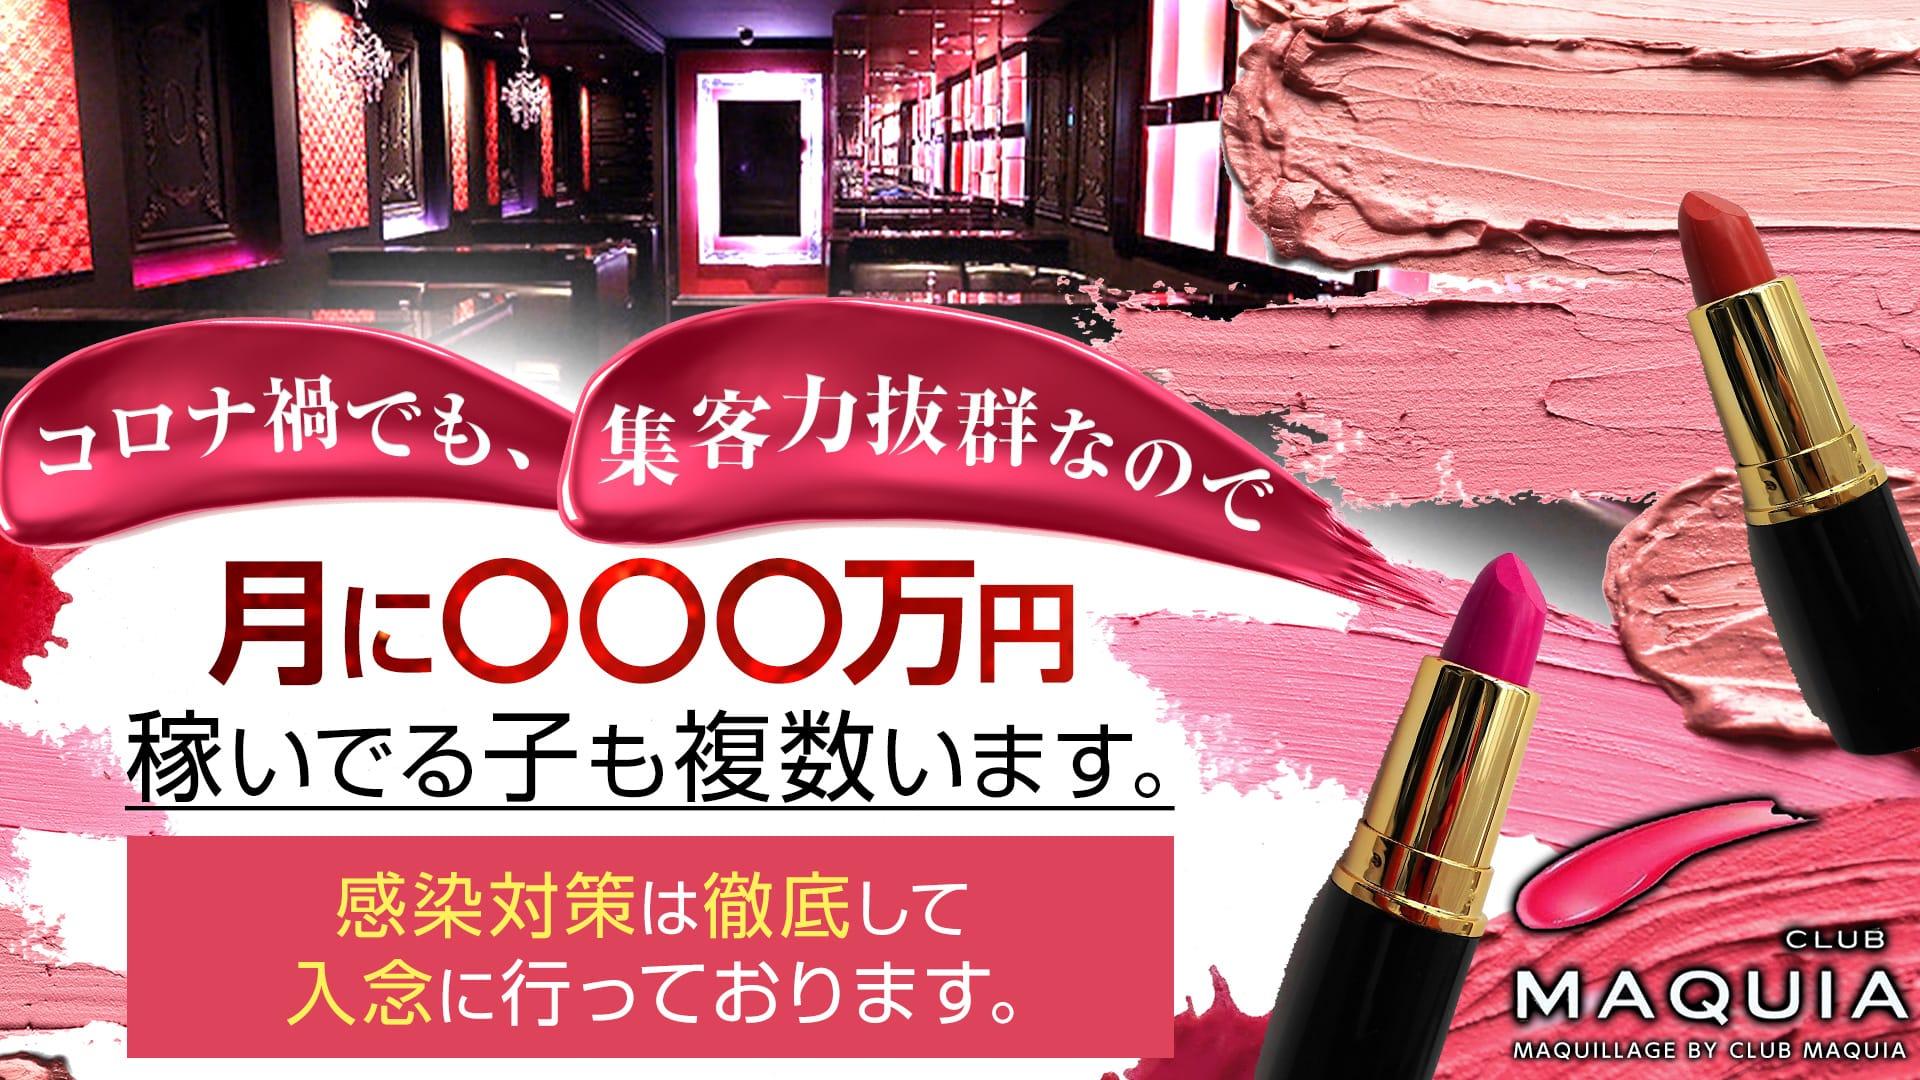 Club Maquia(マキア)【公式求人・体入情報】 高崎キャバクラ TOP画像